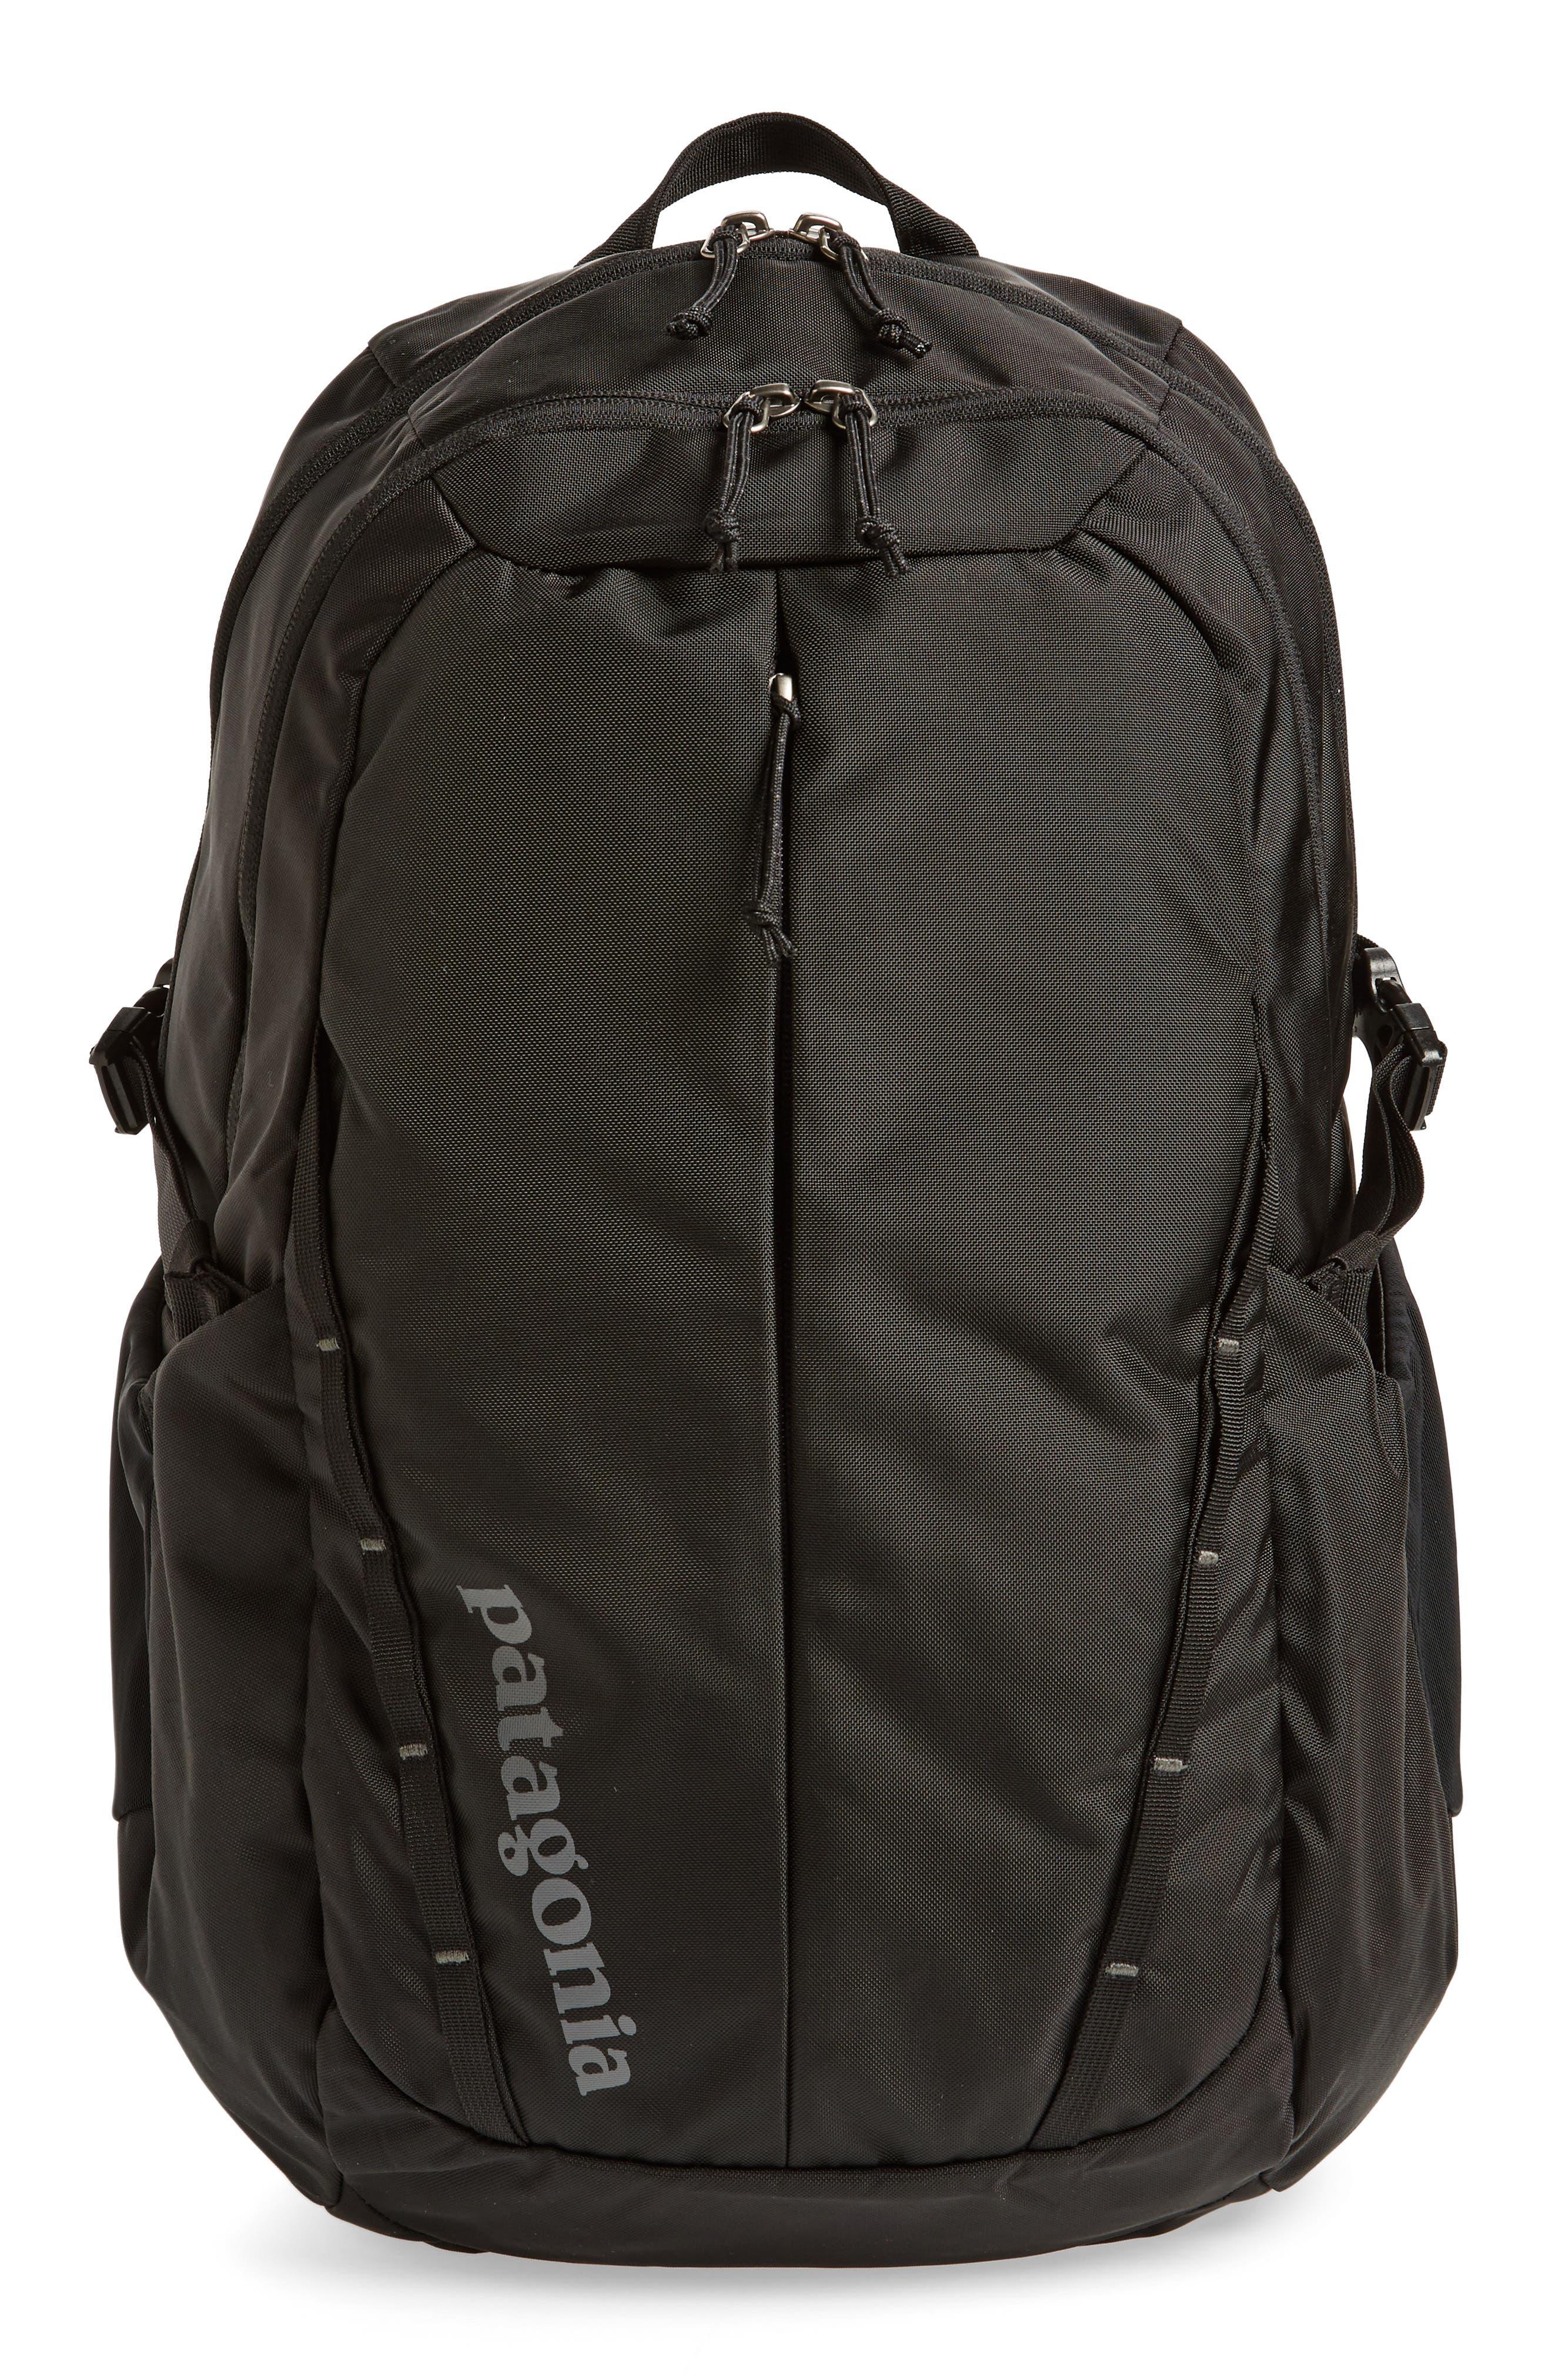 PATAGONIA, Refugio 28-Liter Backpack, Main thumbnail 1, color, 001